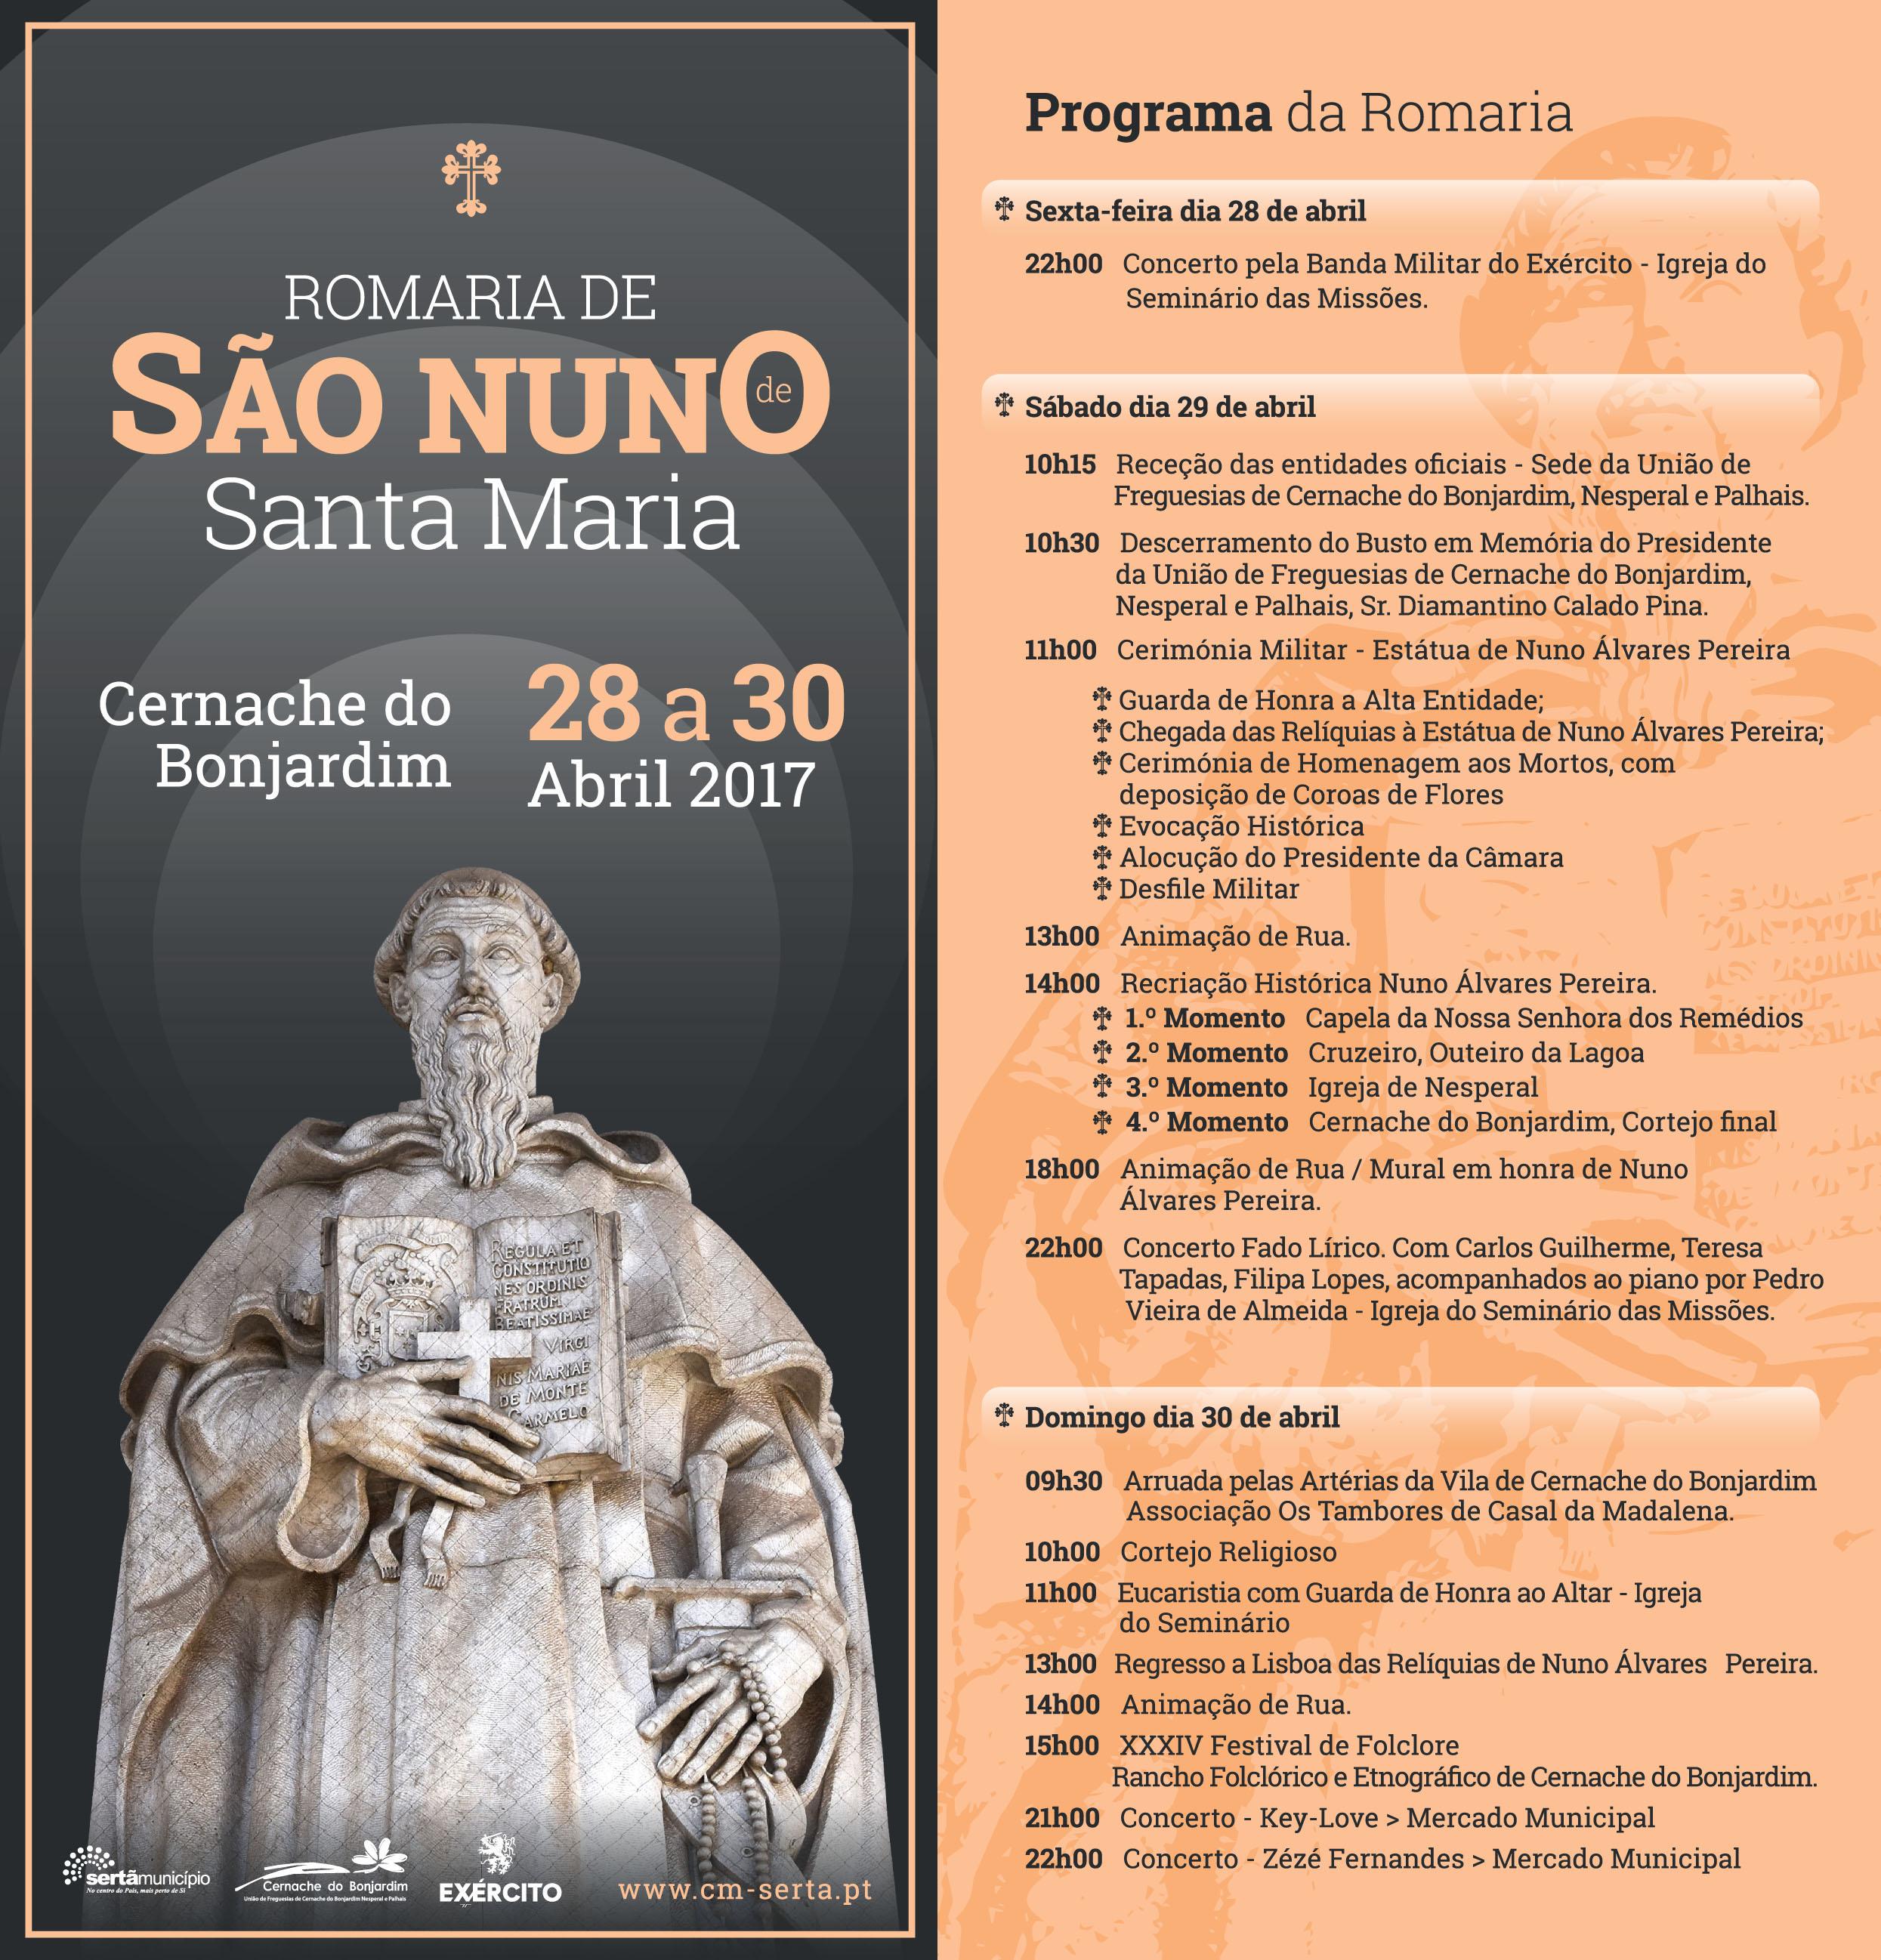 Romaria de São Nuno de Santa Maria